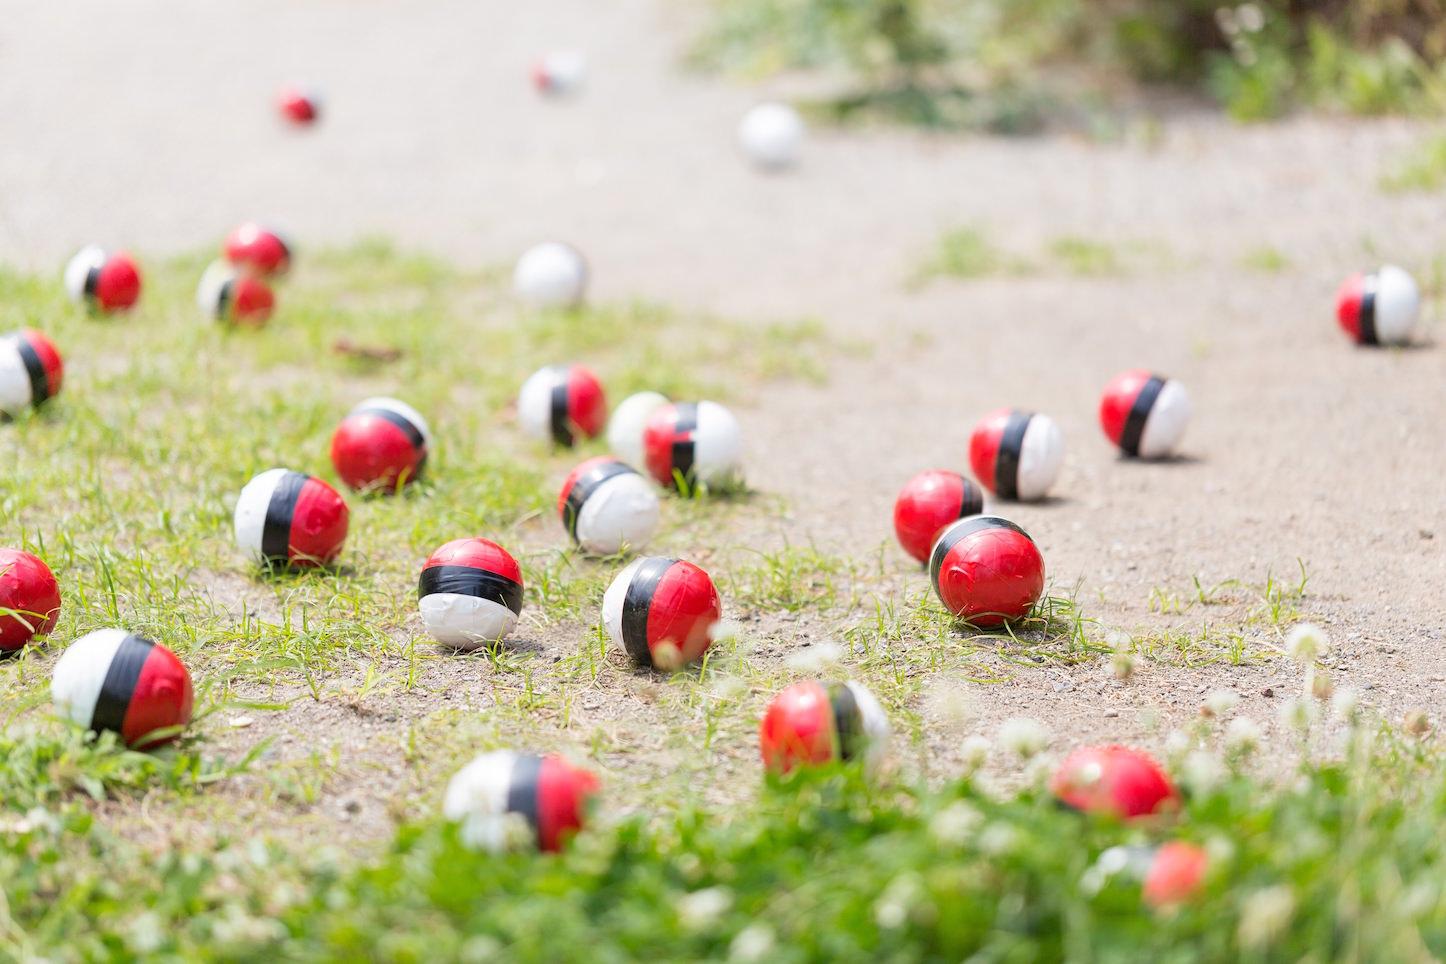 Lots and lots of pokemon balls